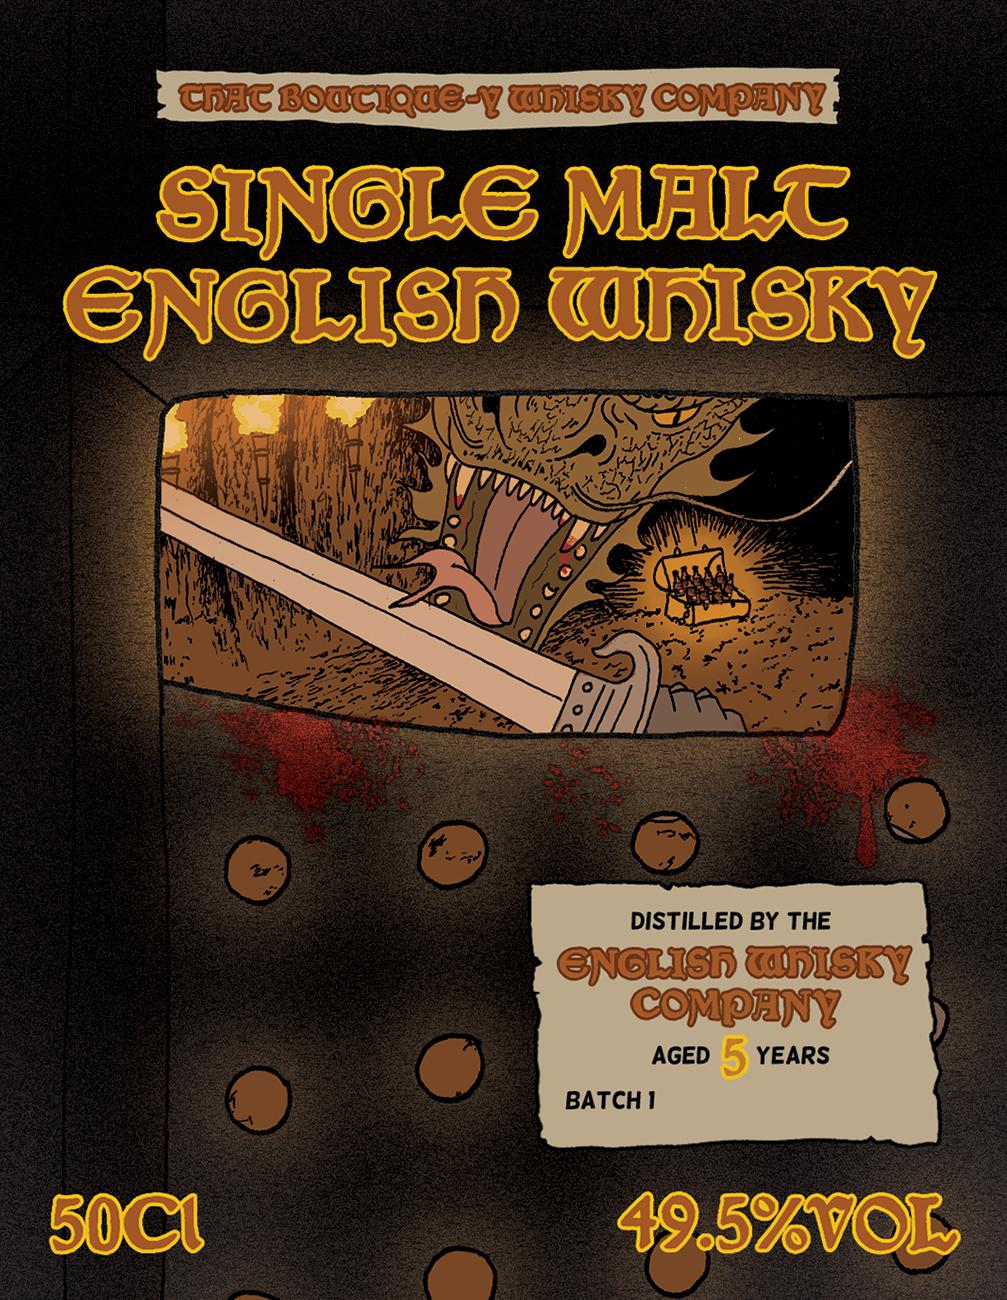 English Whisky Co B1.jpg